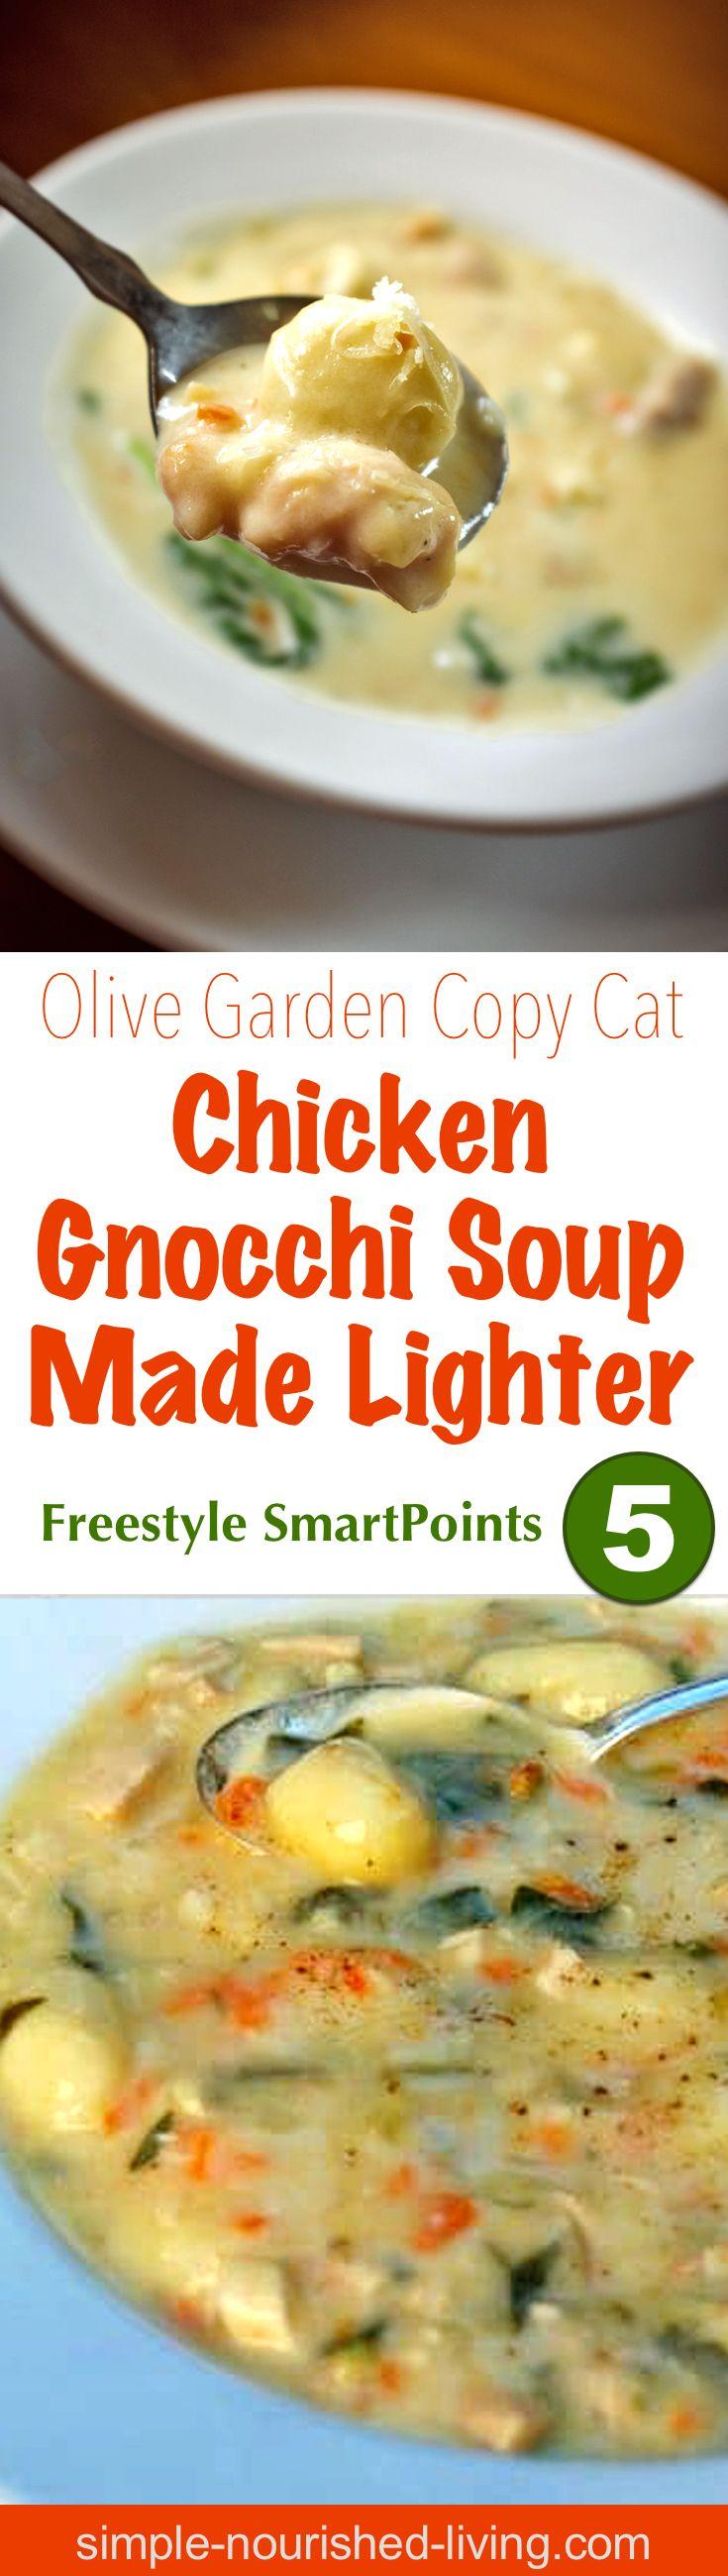 Olive Garden Chicken Gnocchi Soup Recipe Made Lighter